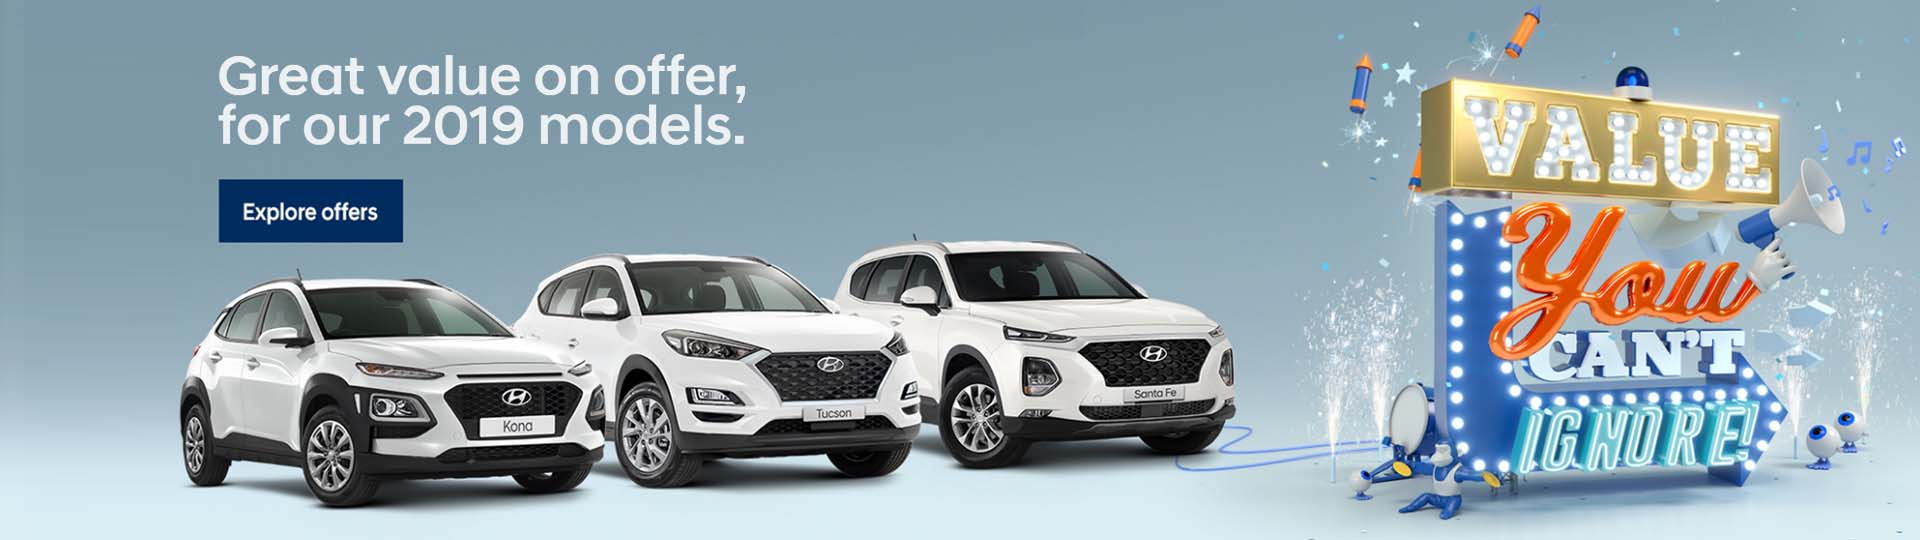 Hyundai, Subaru, Kia, Honda, Suzuki, Renault, Isuzu Ute